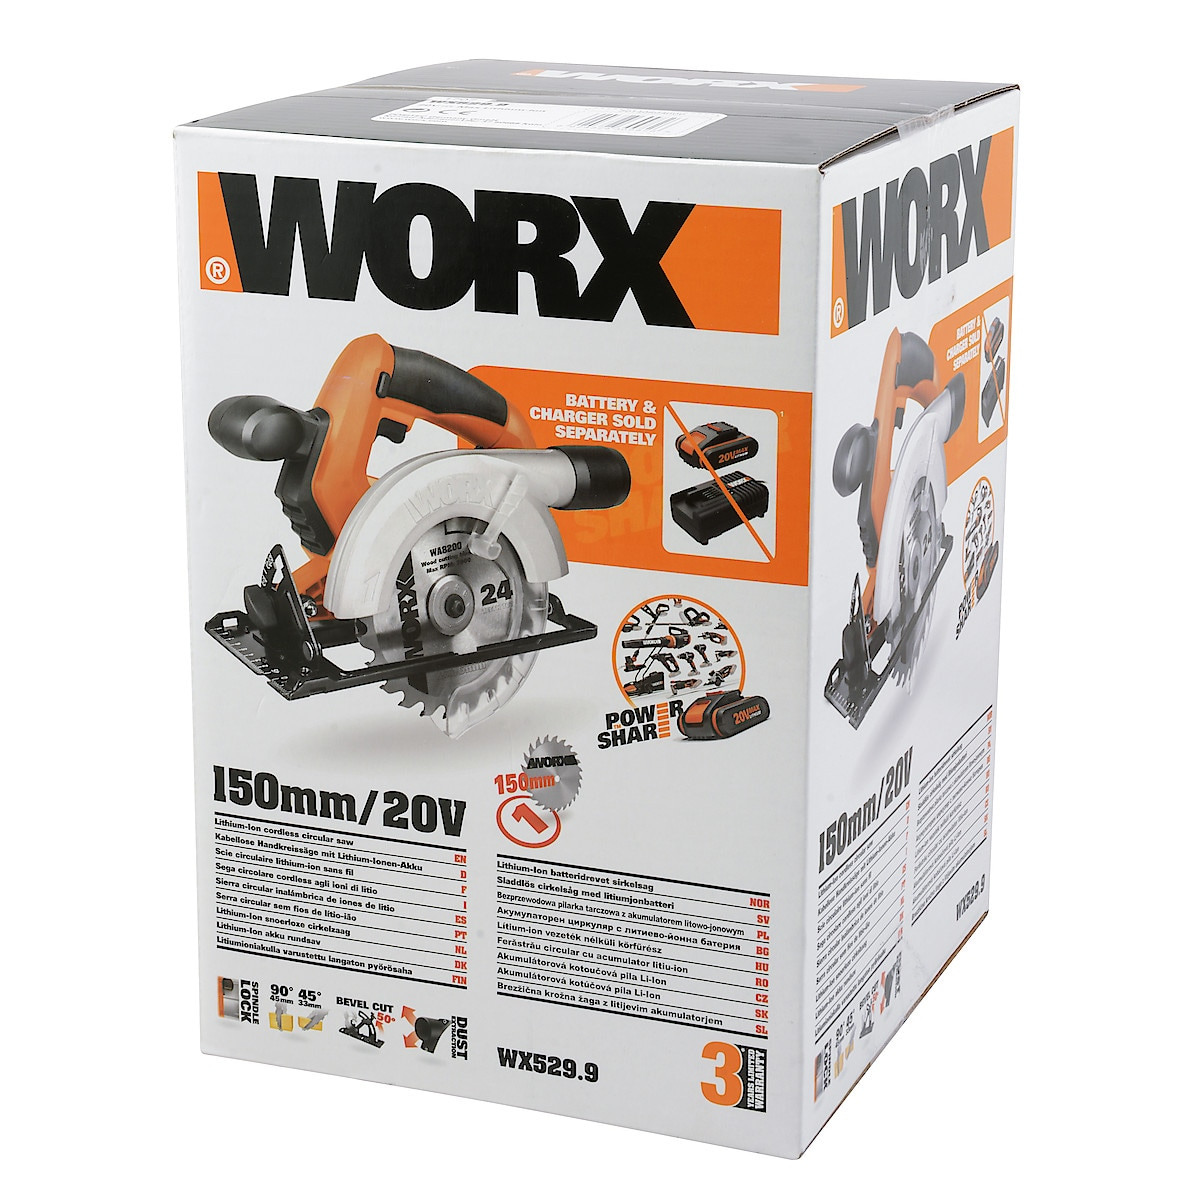 Worx WX529.9 sirkelsag